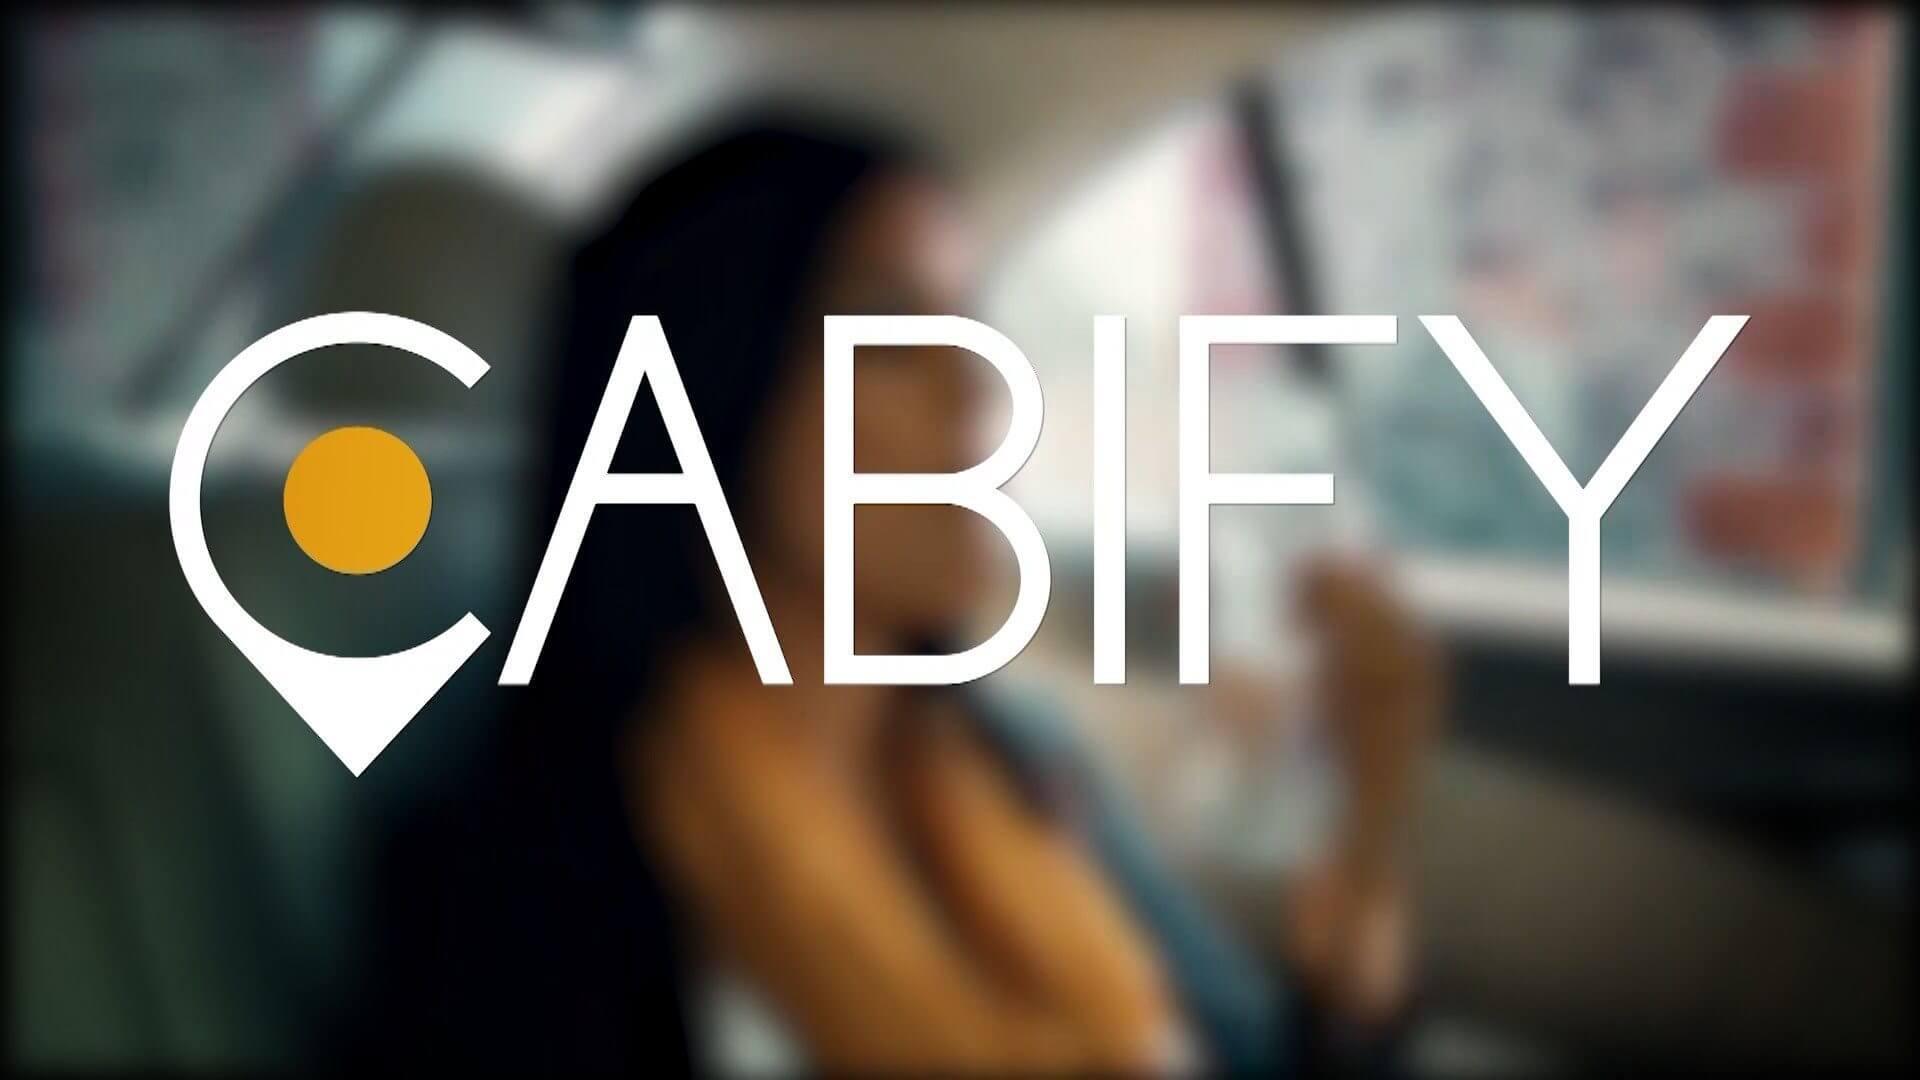 Guerra acirrada! Easy e Cabify se unem contra 99 e Uber